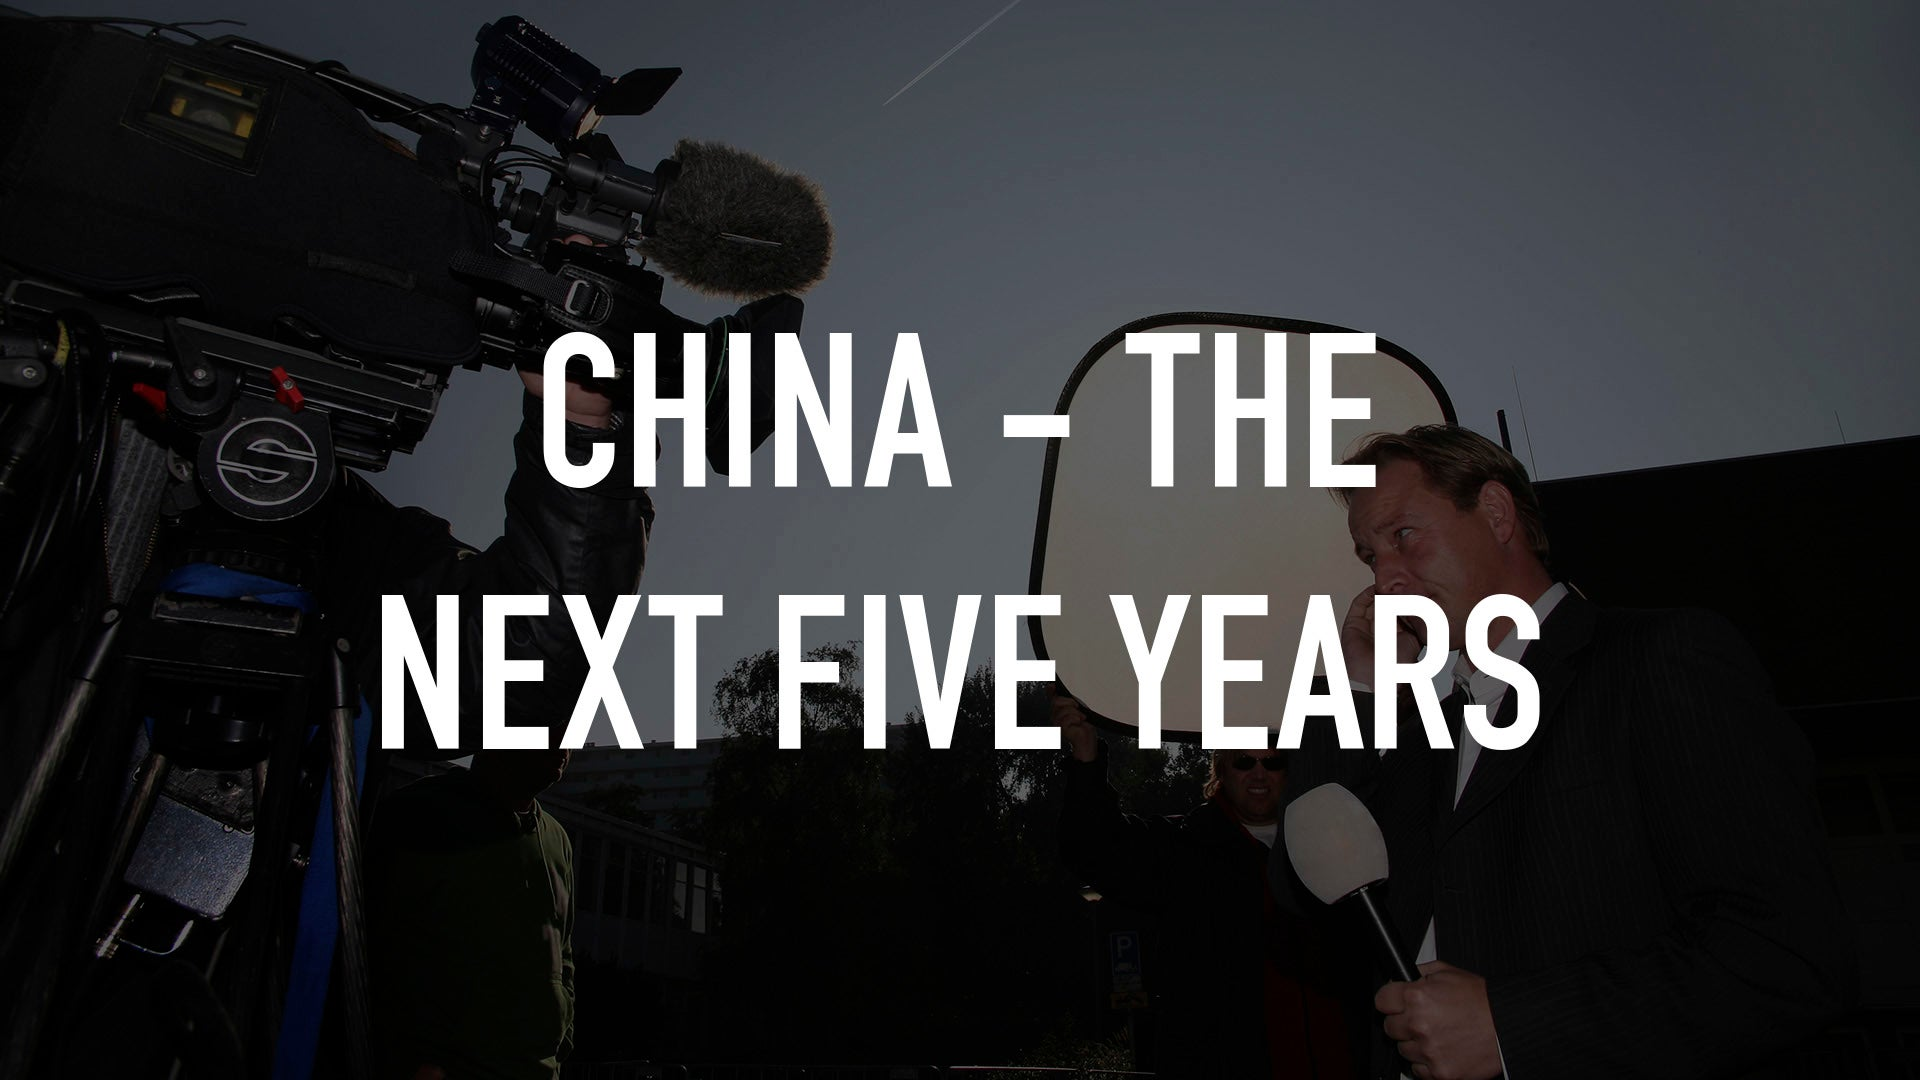 China - The Next Five Years